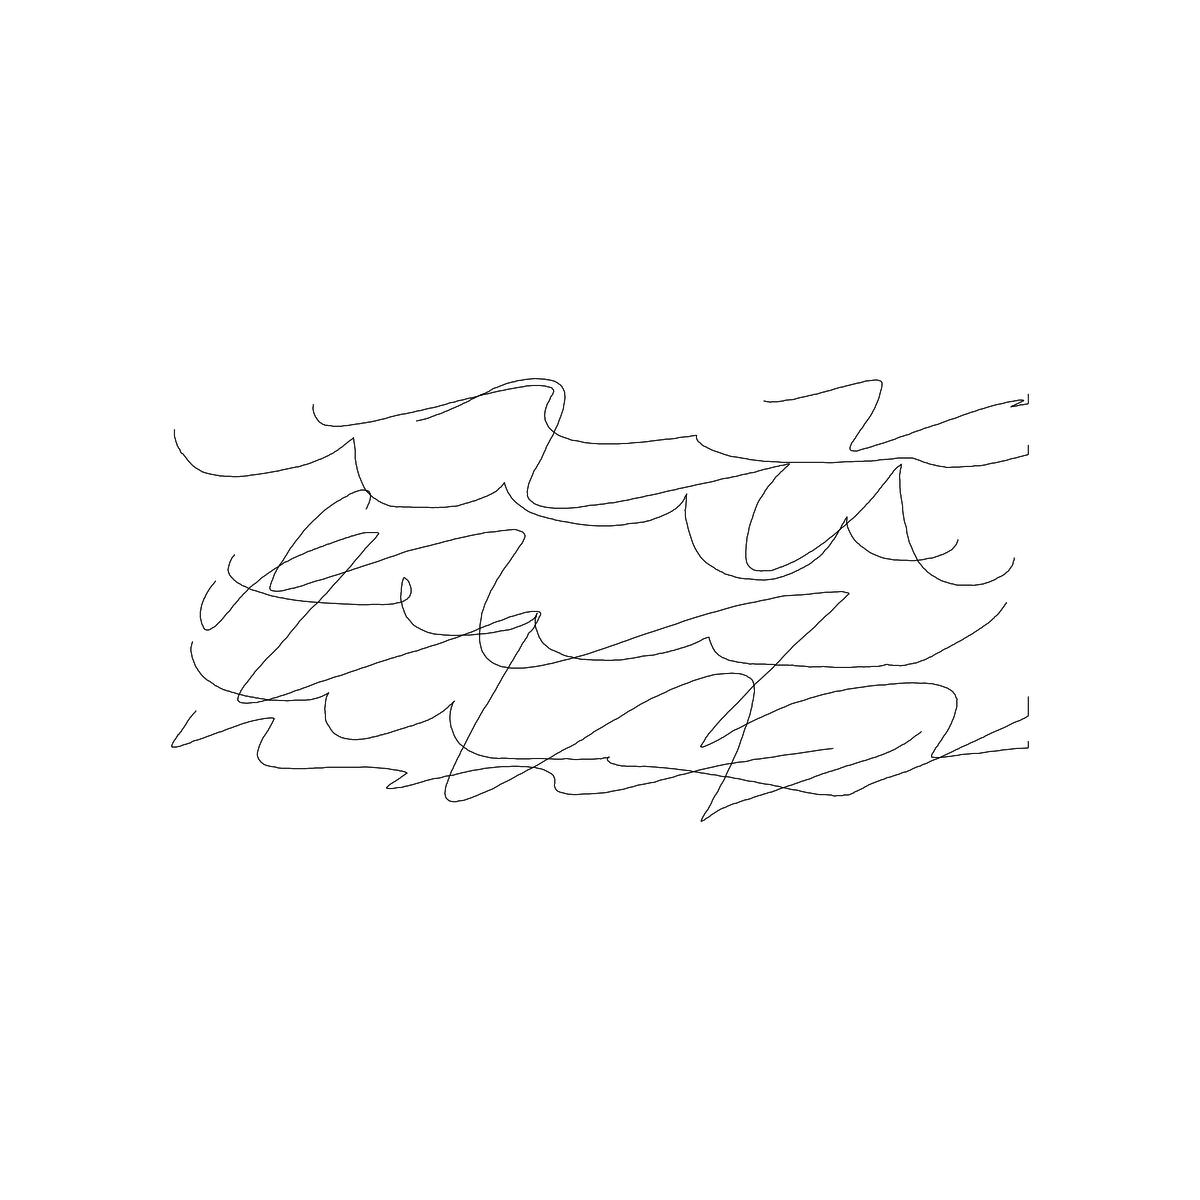 BAAAM drawing#23460 lat:50.9743080139160160lng: 1.8362116813659668